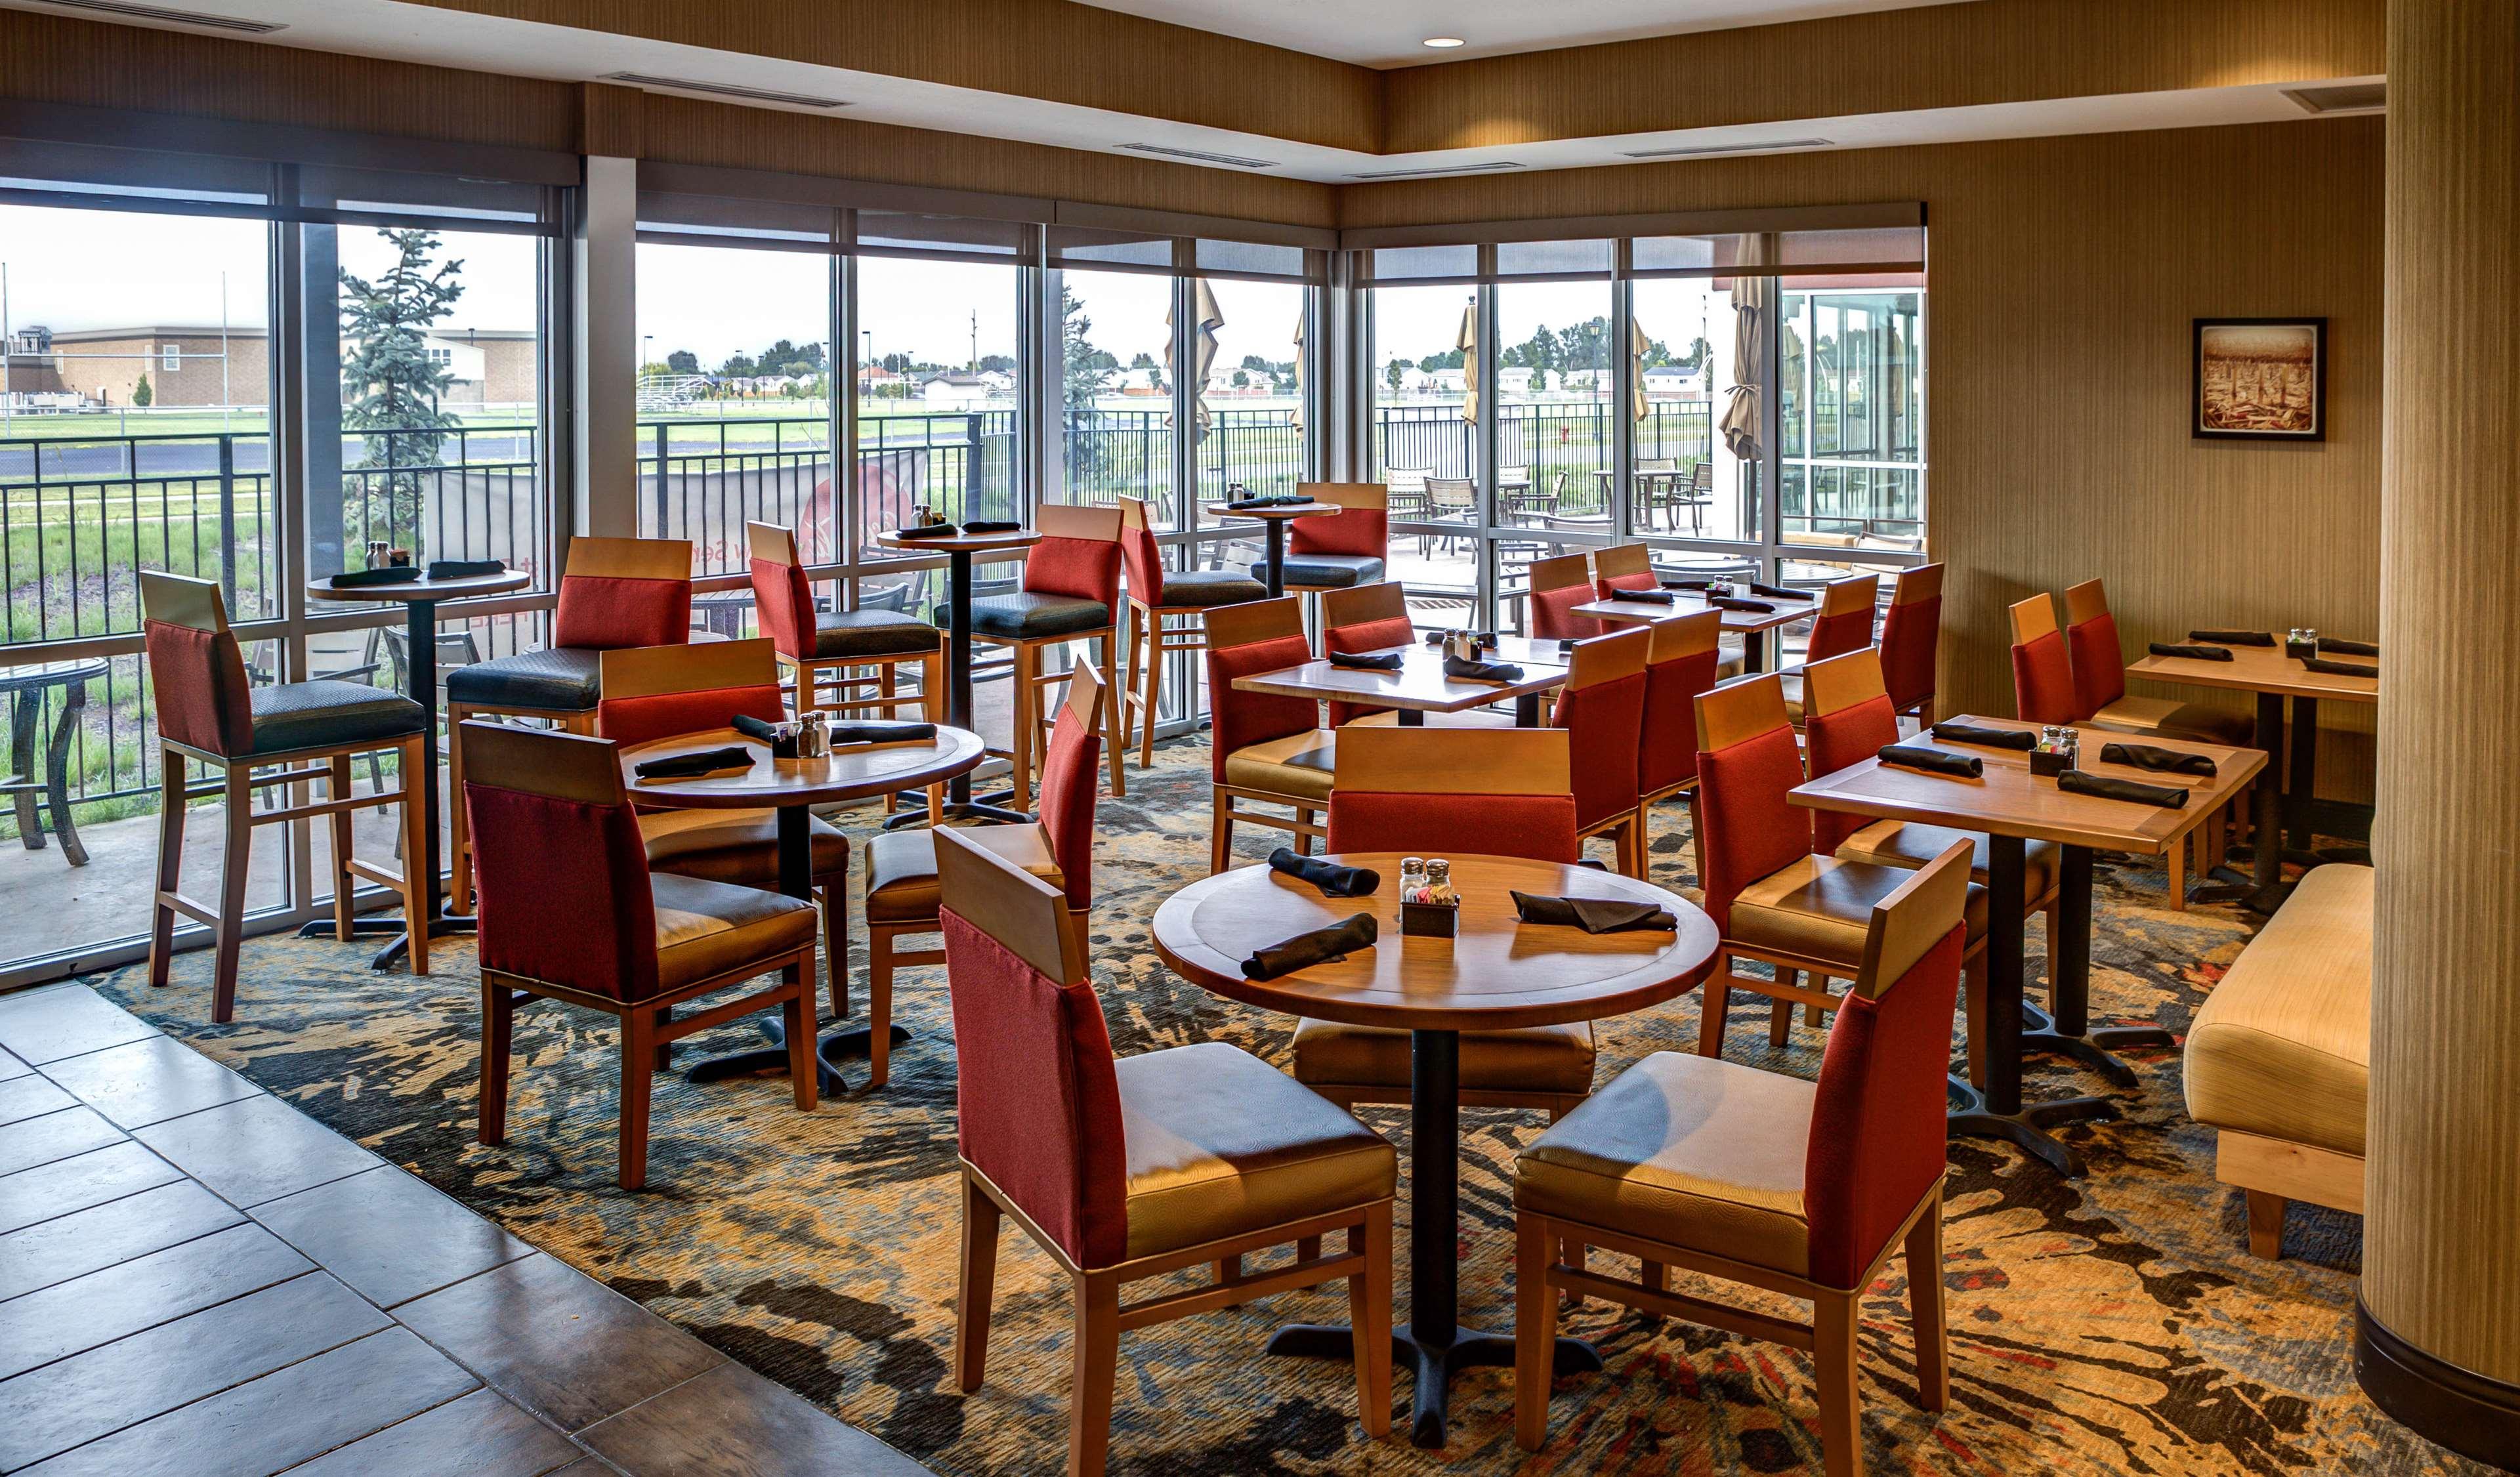 DoubleTree by Hilton West Fargo image 11